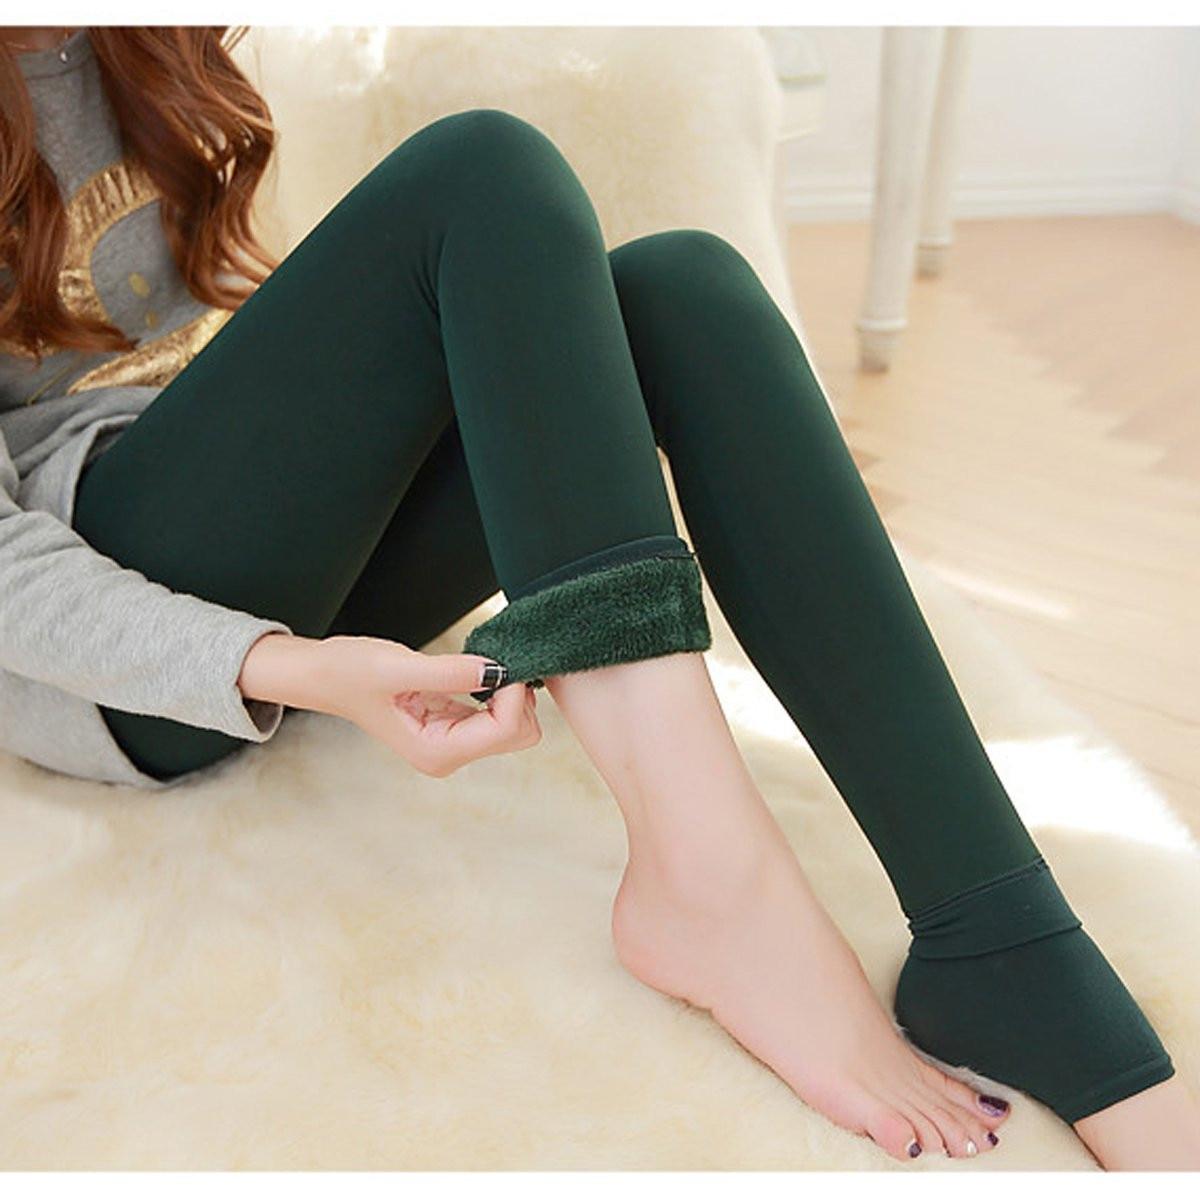 Newly Women Heat Fleece Winter Stretchy Leggings Warm Fleece Lined Slim Thermal Pants pantacollant dropship *35